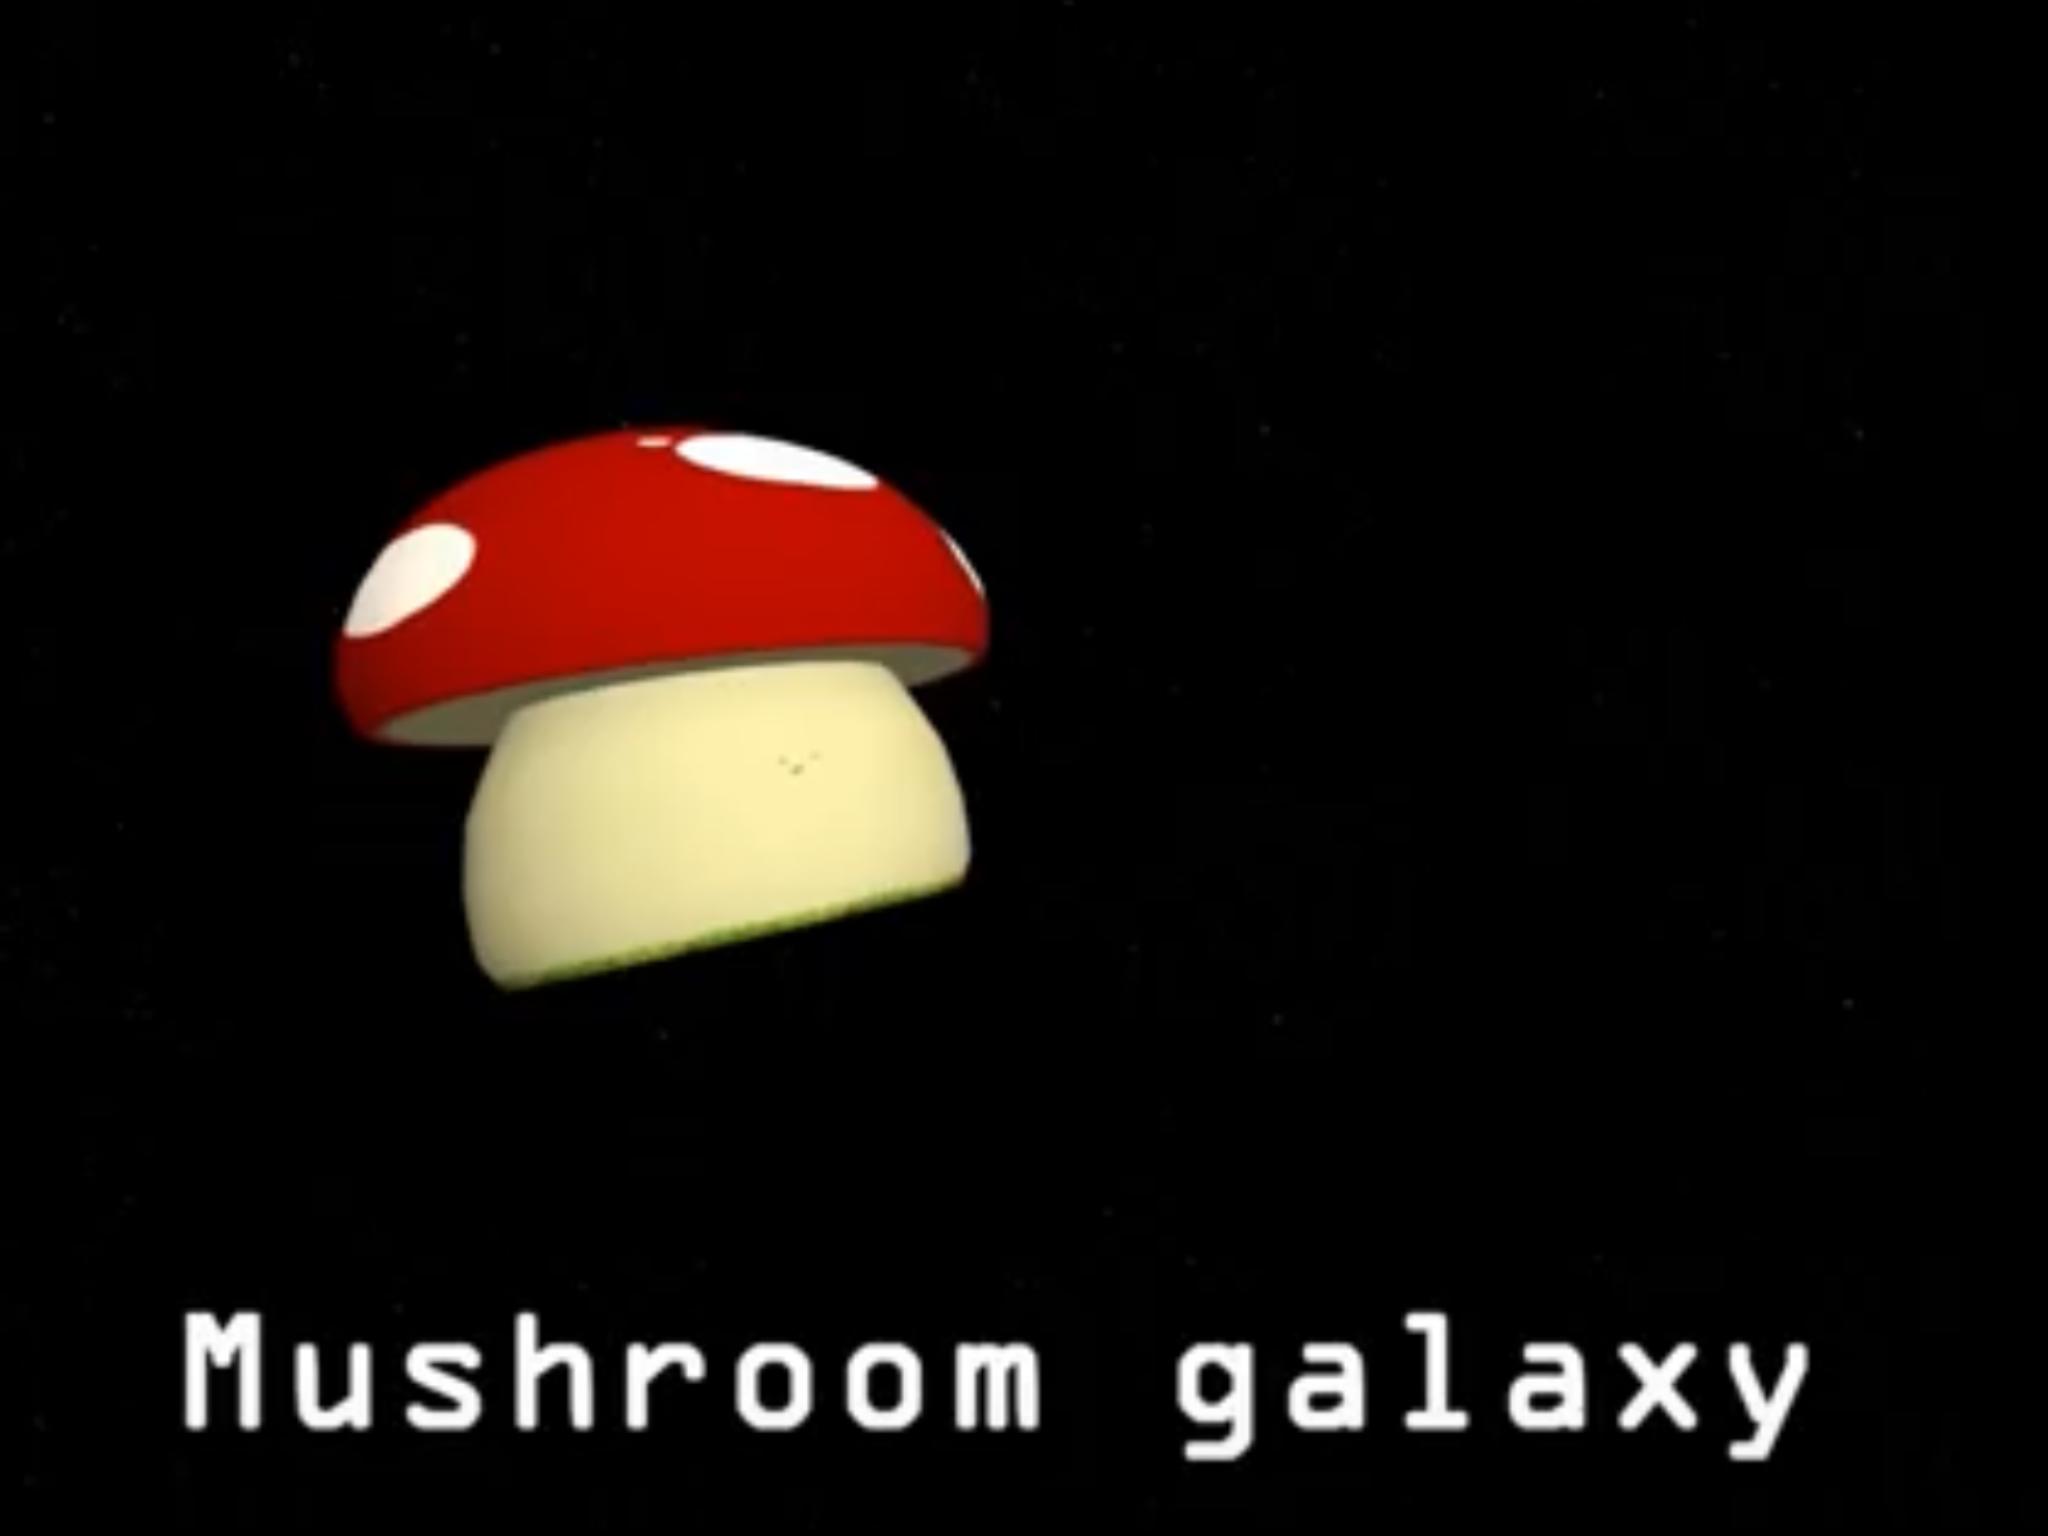 Mushroom Galaxy